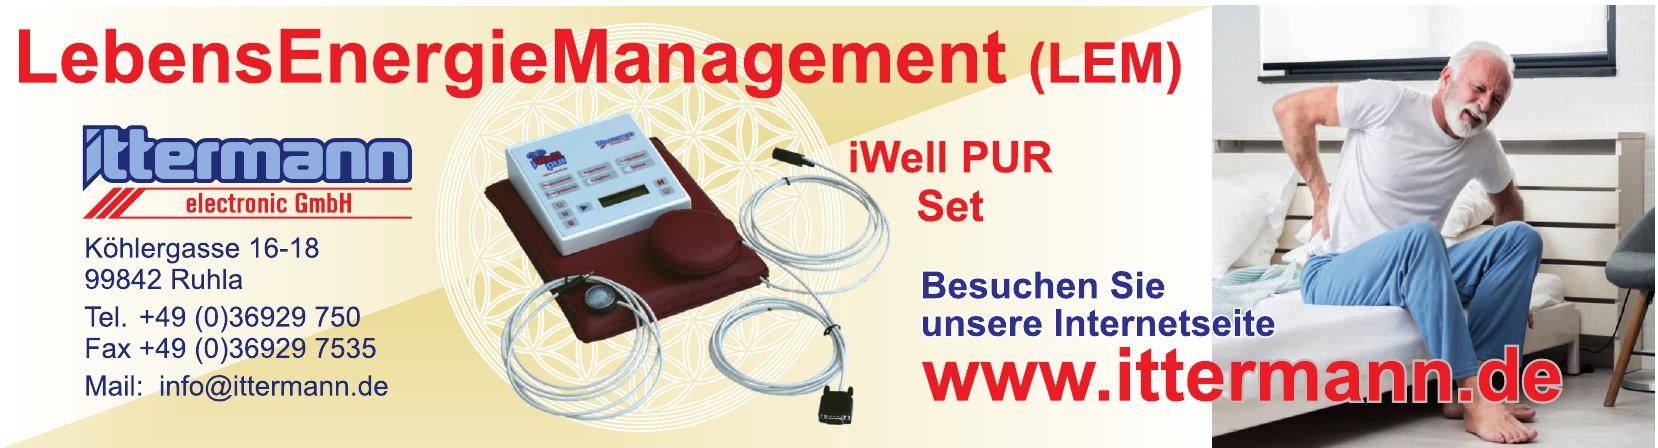 ittermann electronic GmbH